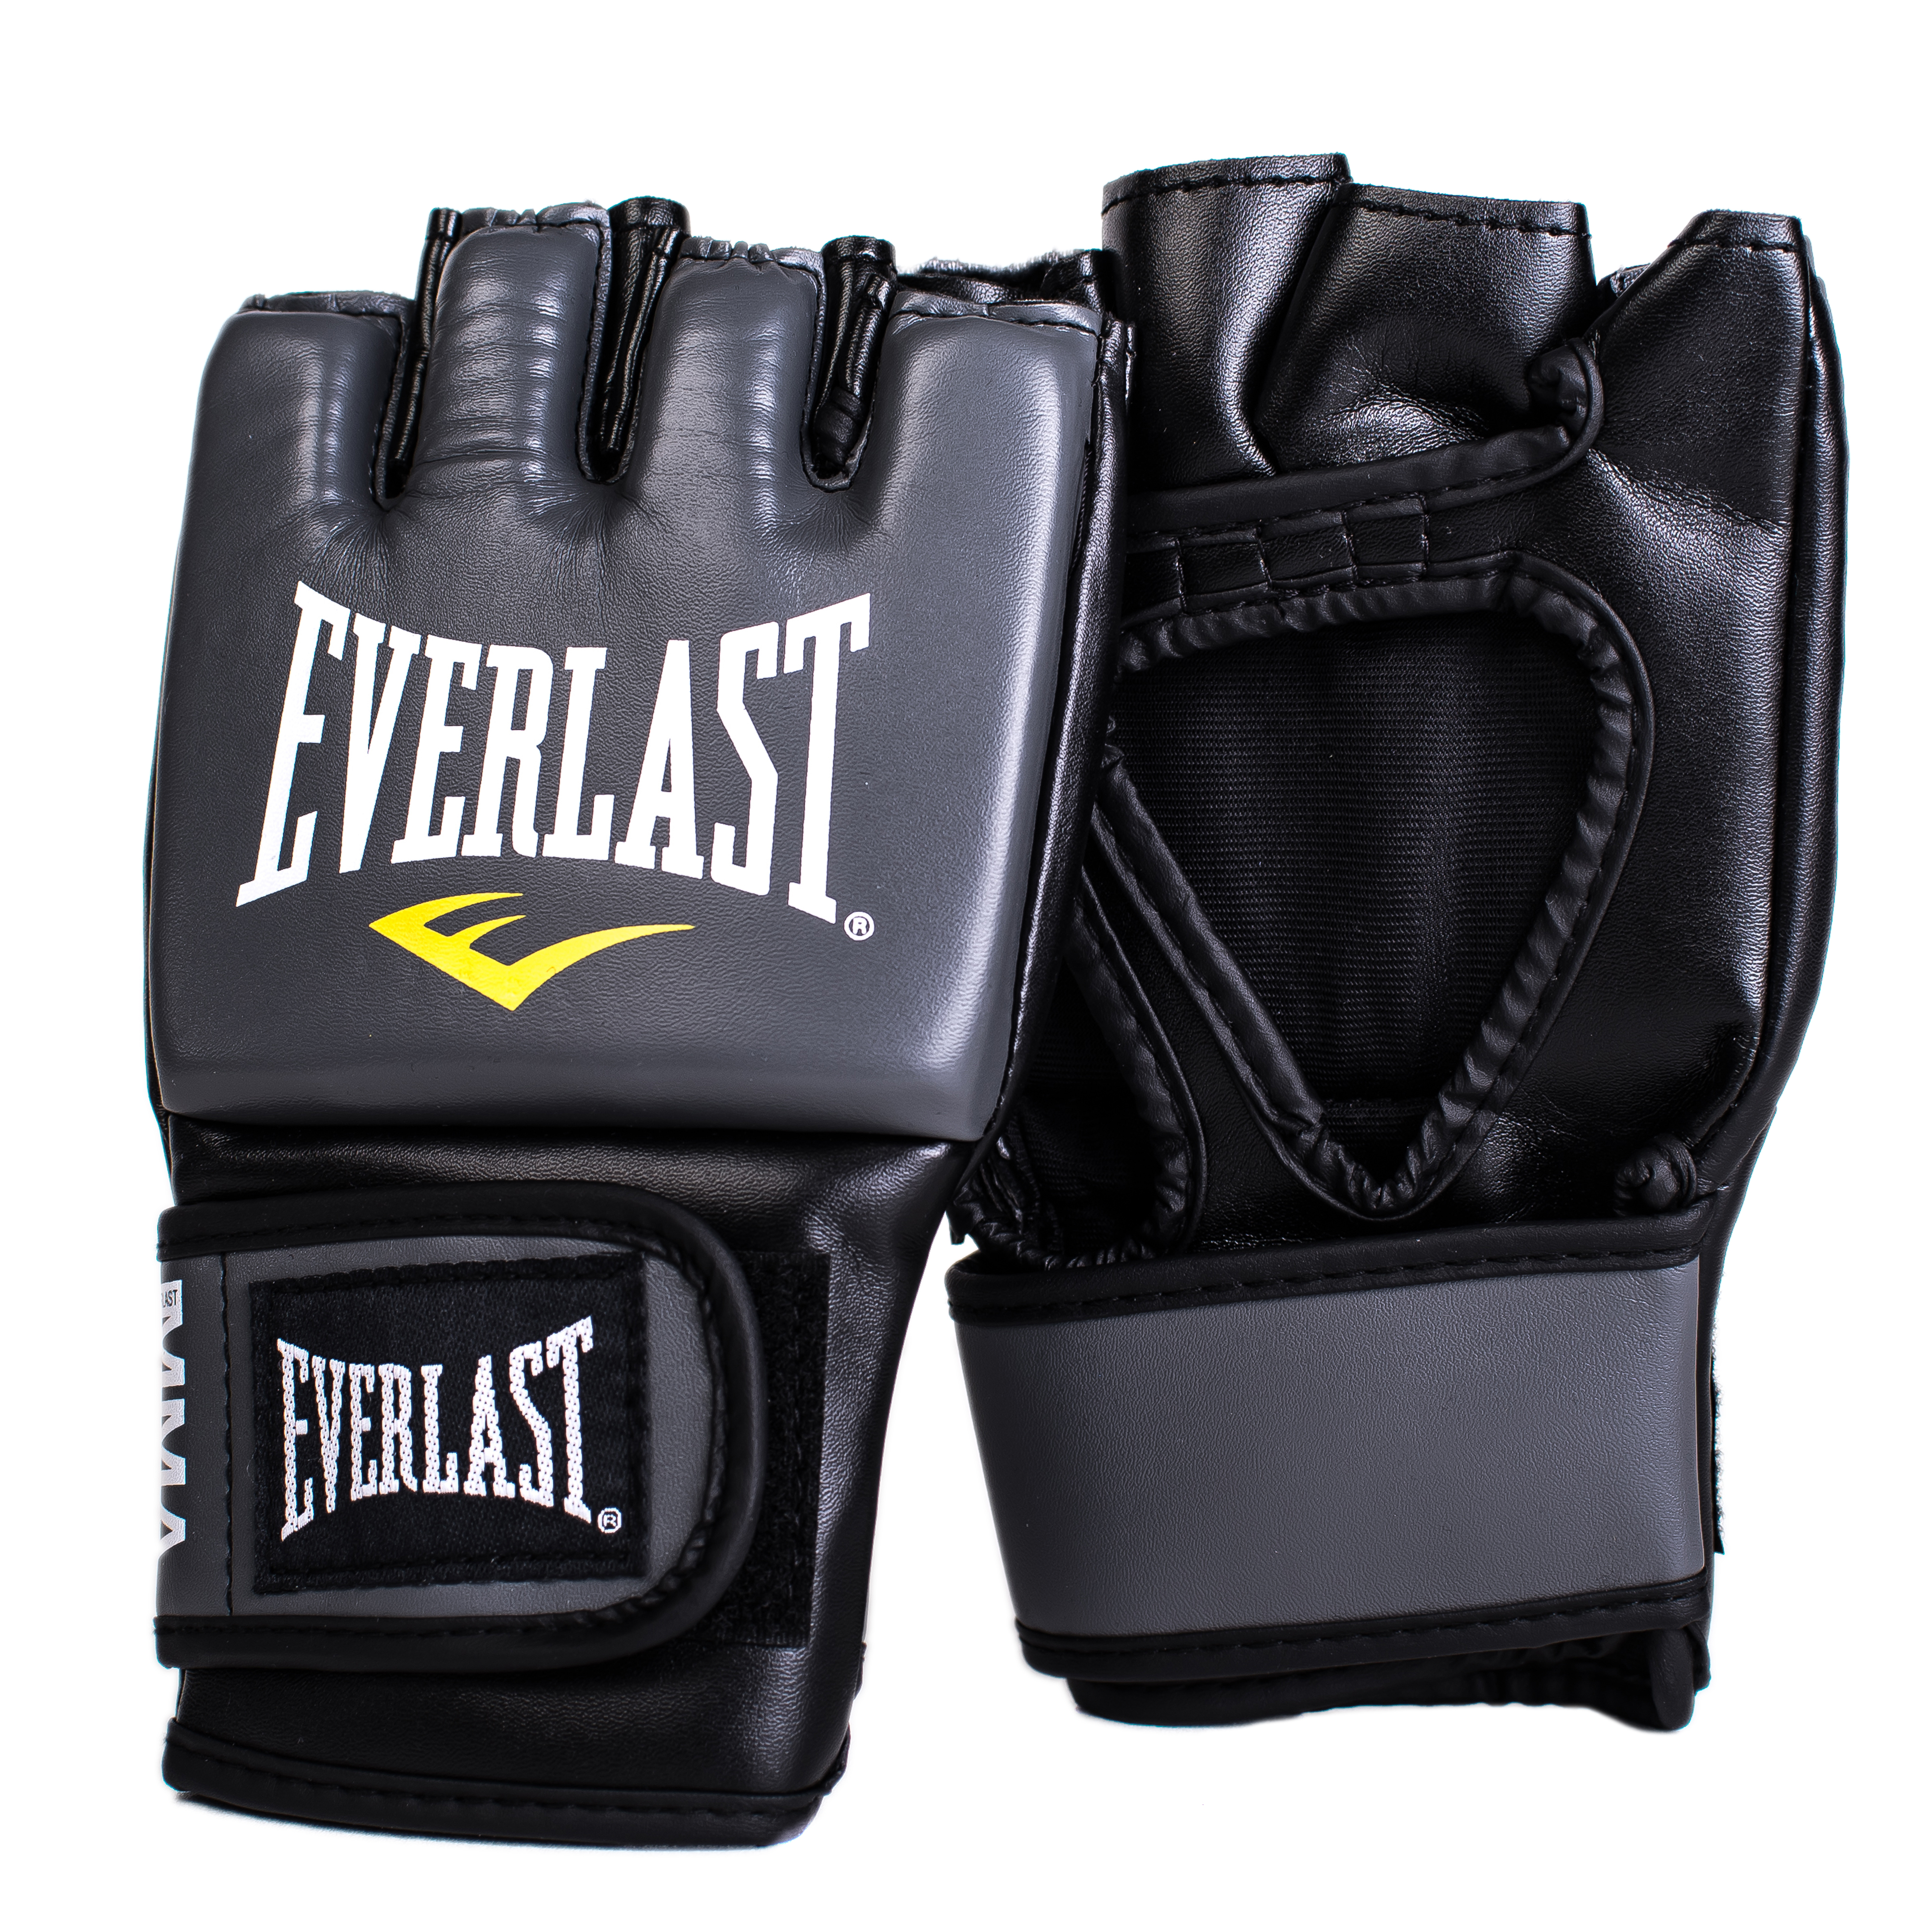 Перчатки тренировочные Everlast Pro Style Grappling, цвет: серый. Размер L/XL цена